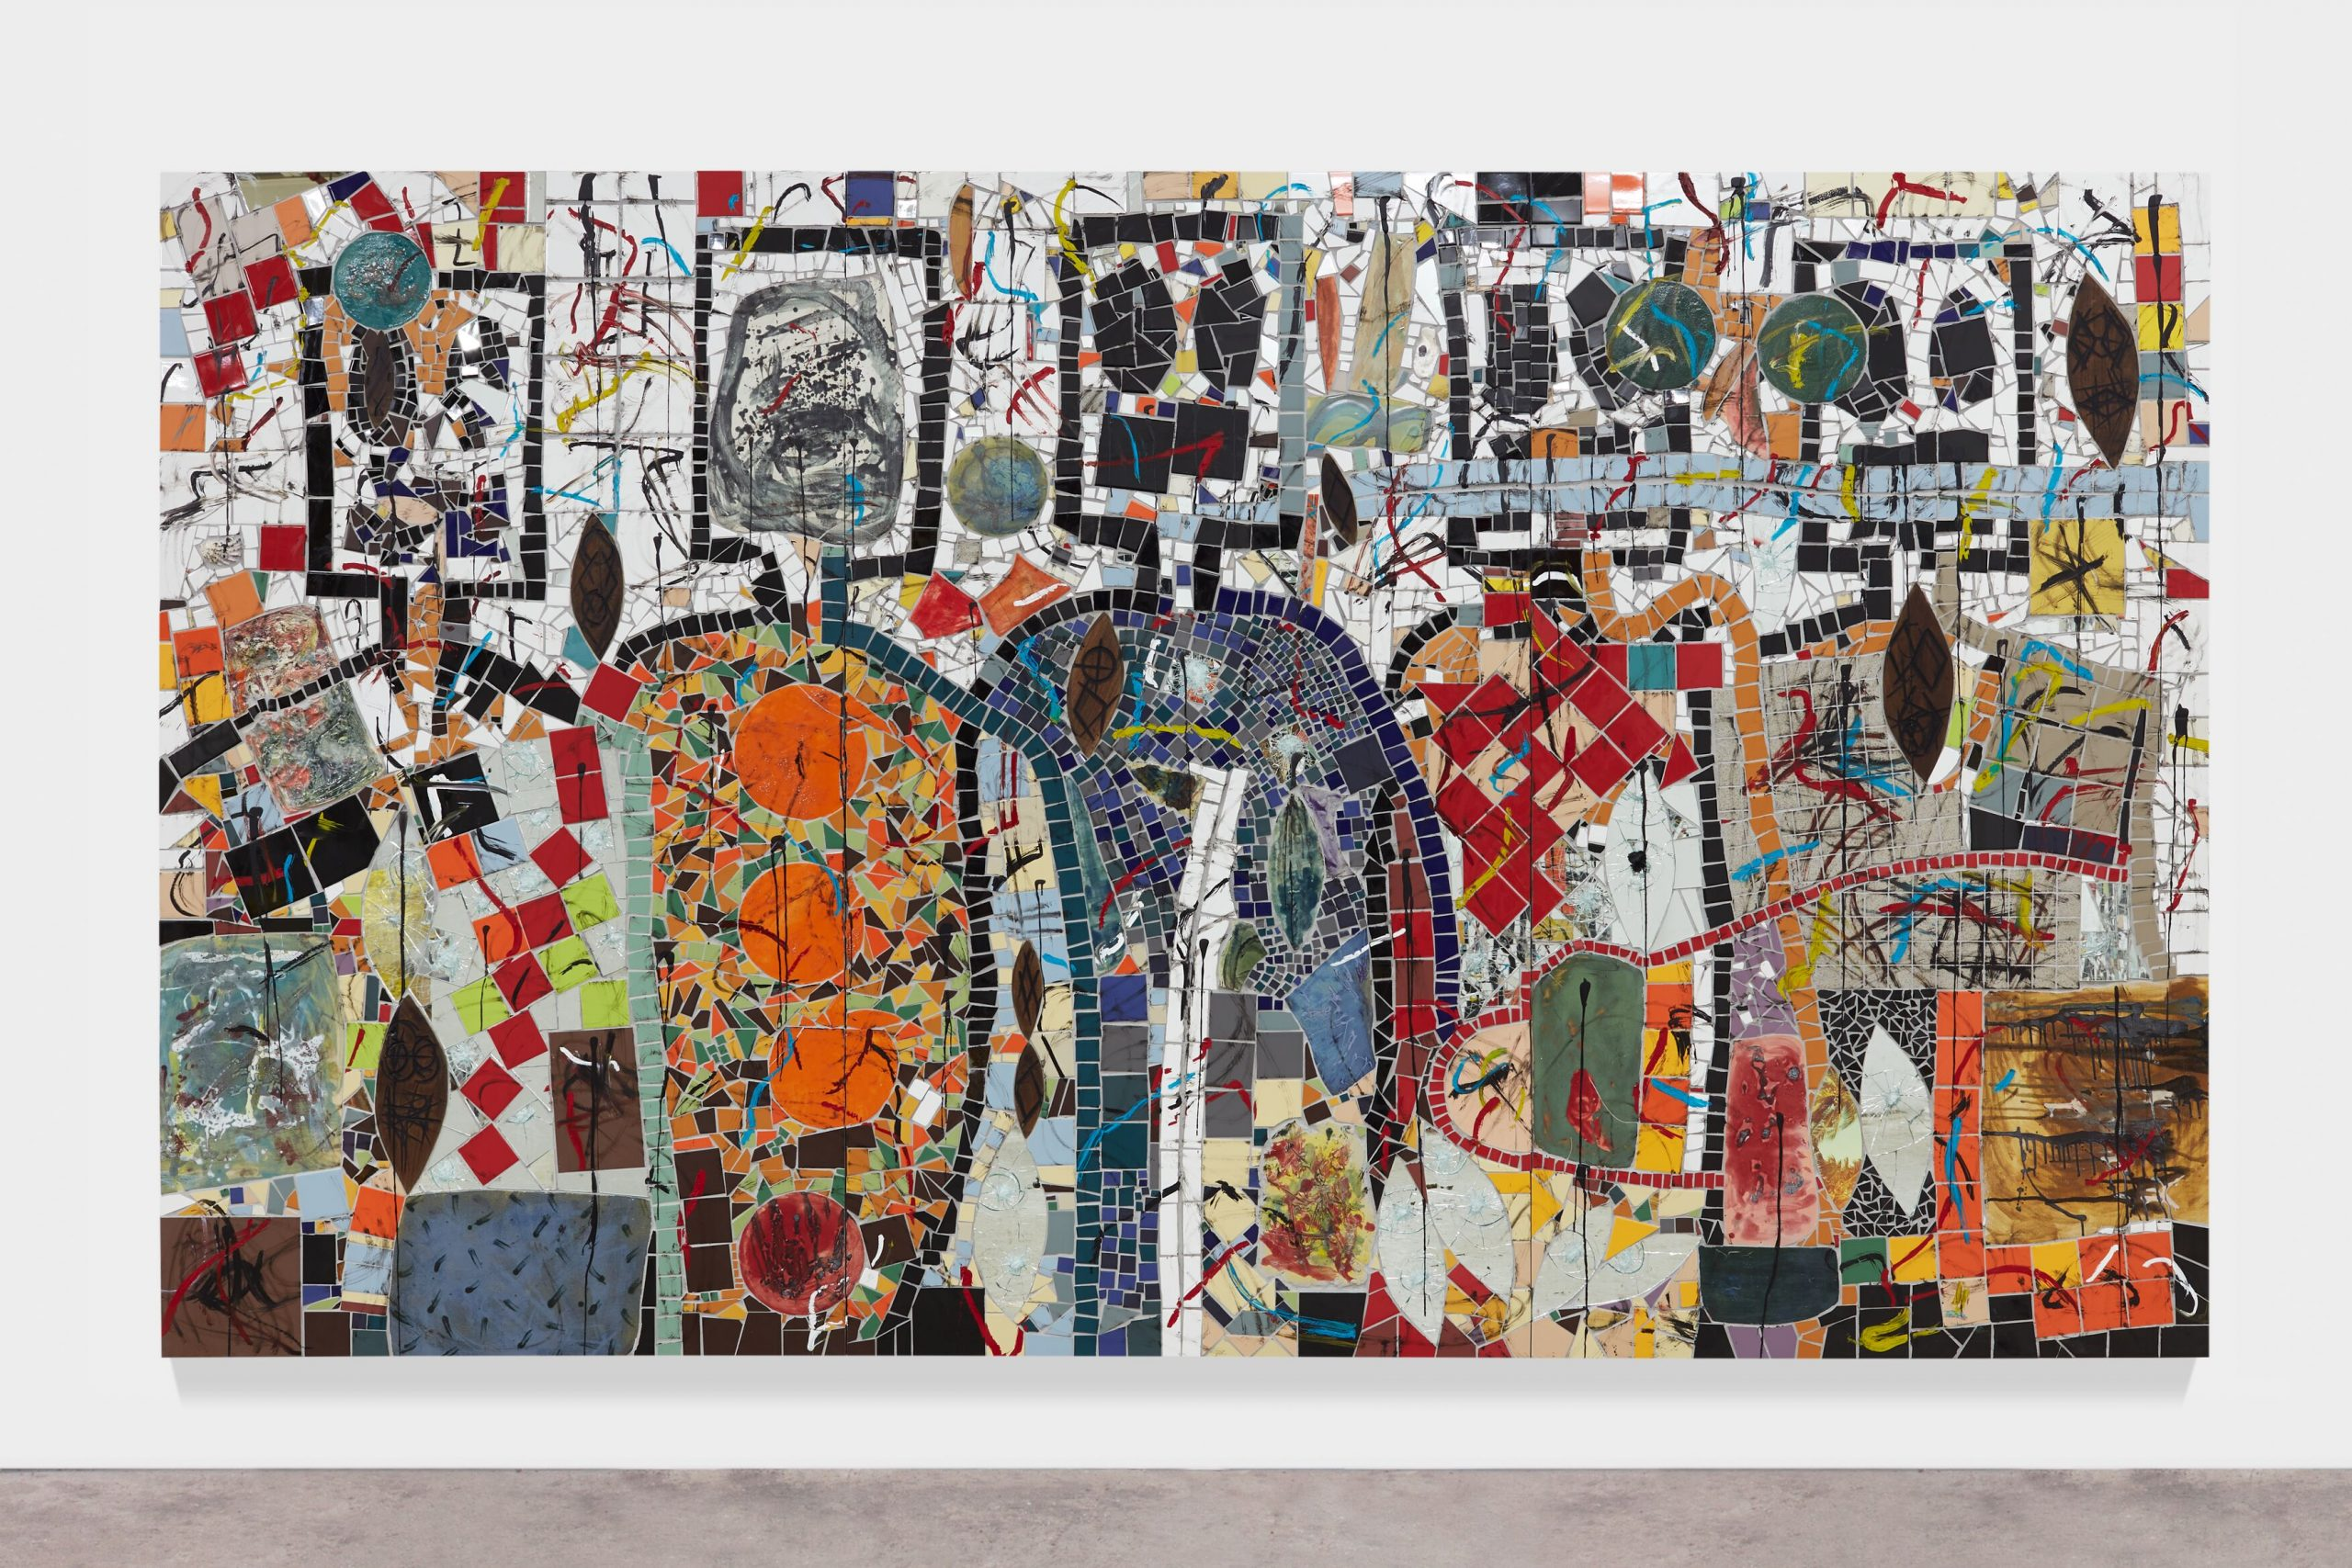 FAD magazine Rashid Johnson?The Broken Five?2020?Ceramic tile, mirror tile, spray enamel, oil stick, black soap, wax?250.2 x 430.5 cm Photo: Martin Parsekian